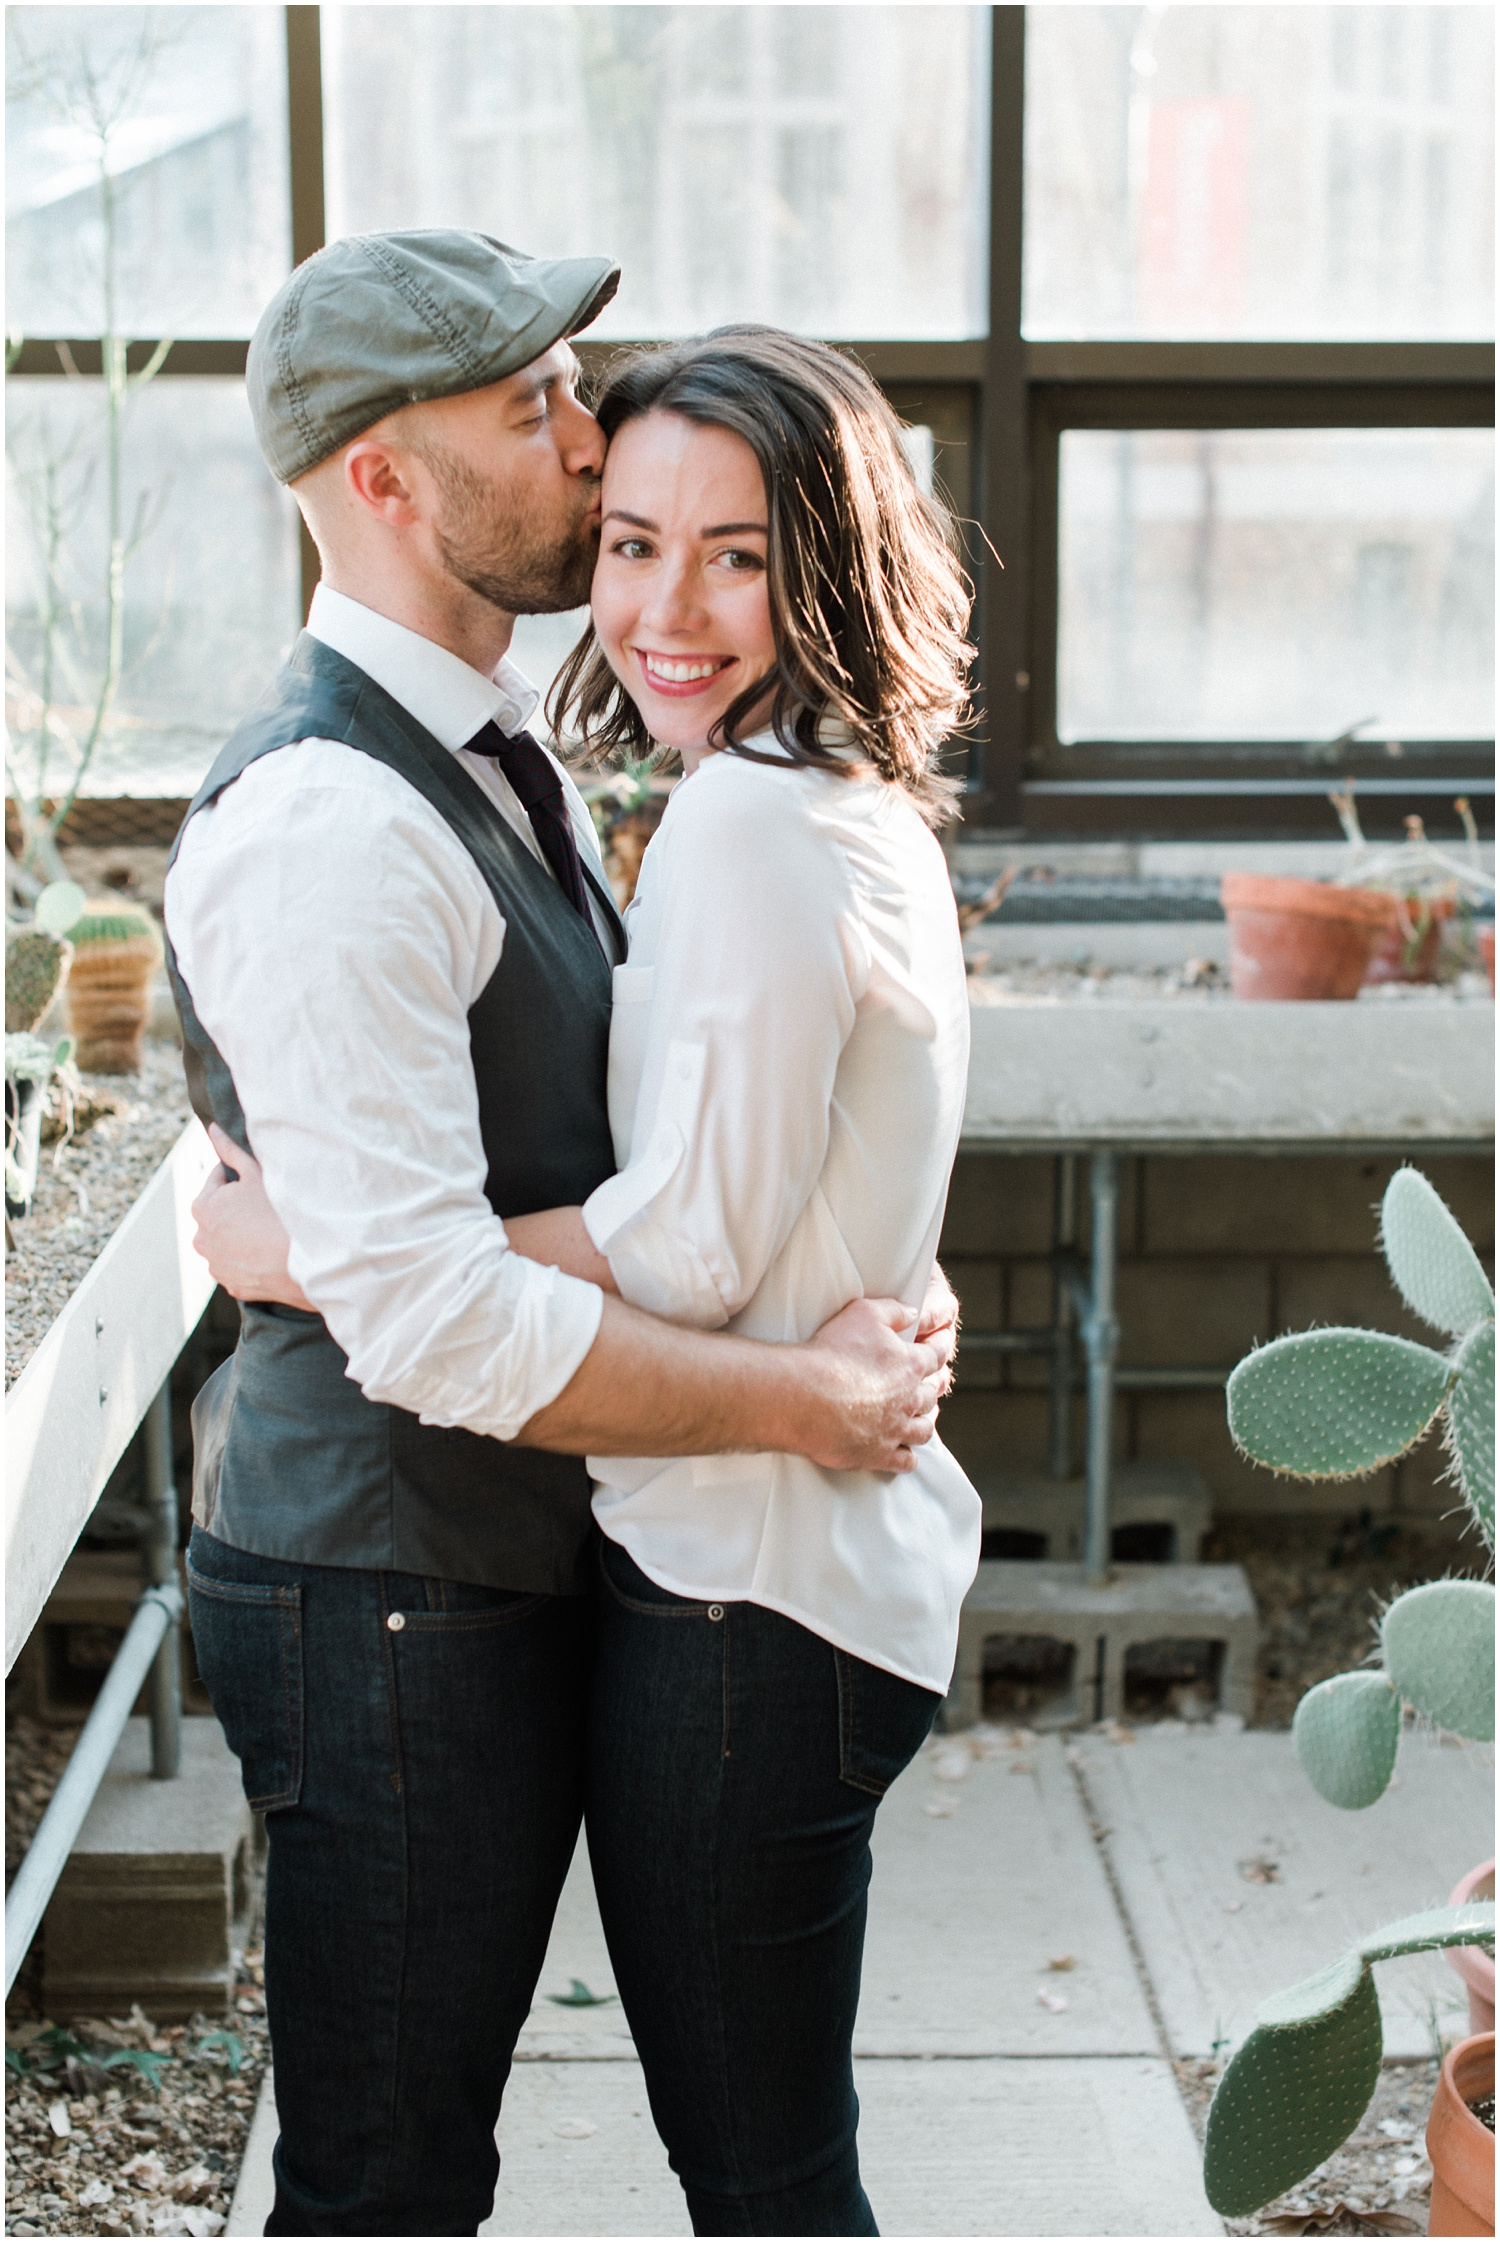 Aimee Thomas _Midwest Ohio Photographer_Engagement Session_0002.jpg